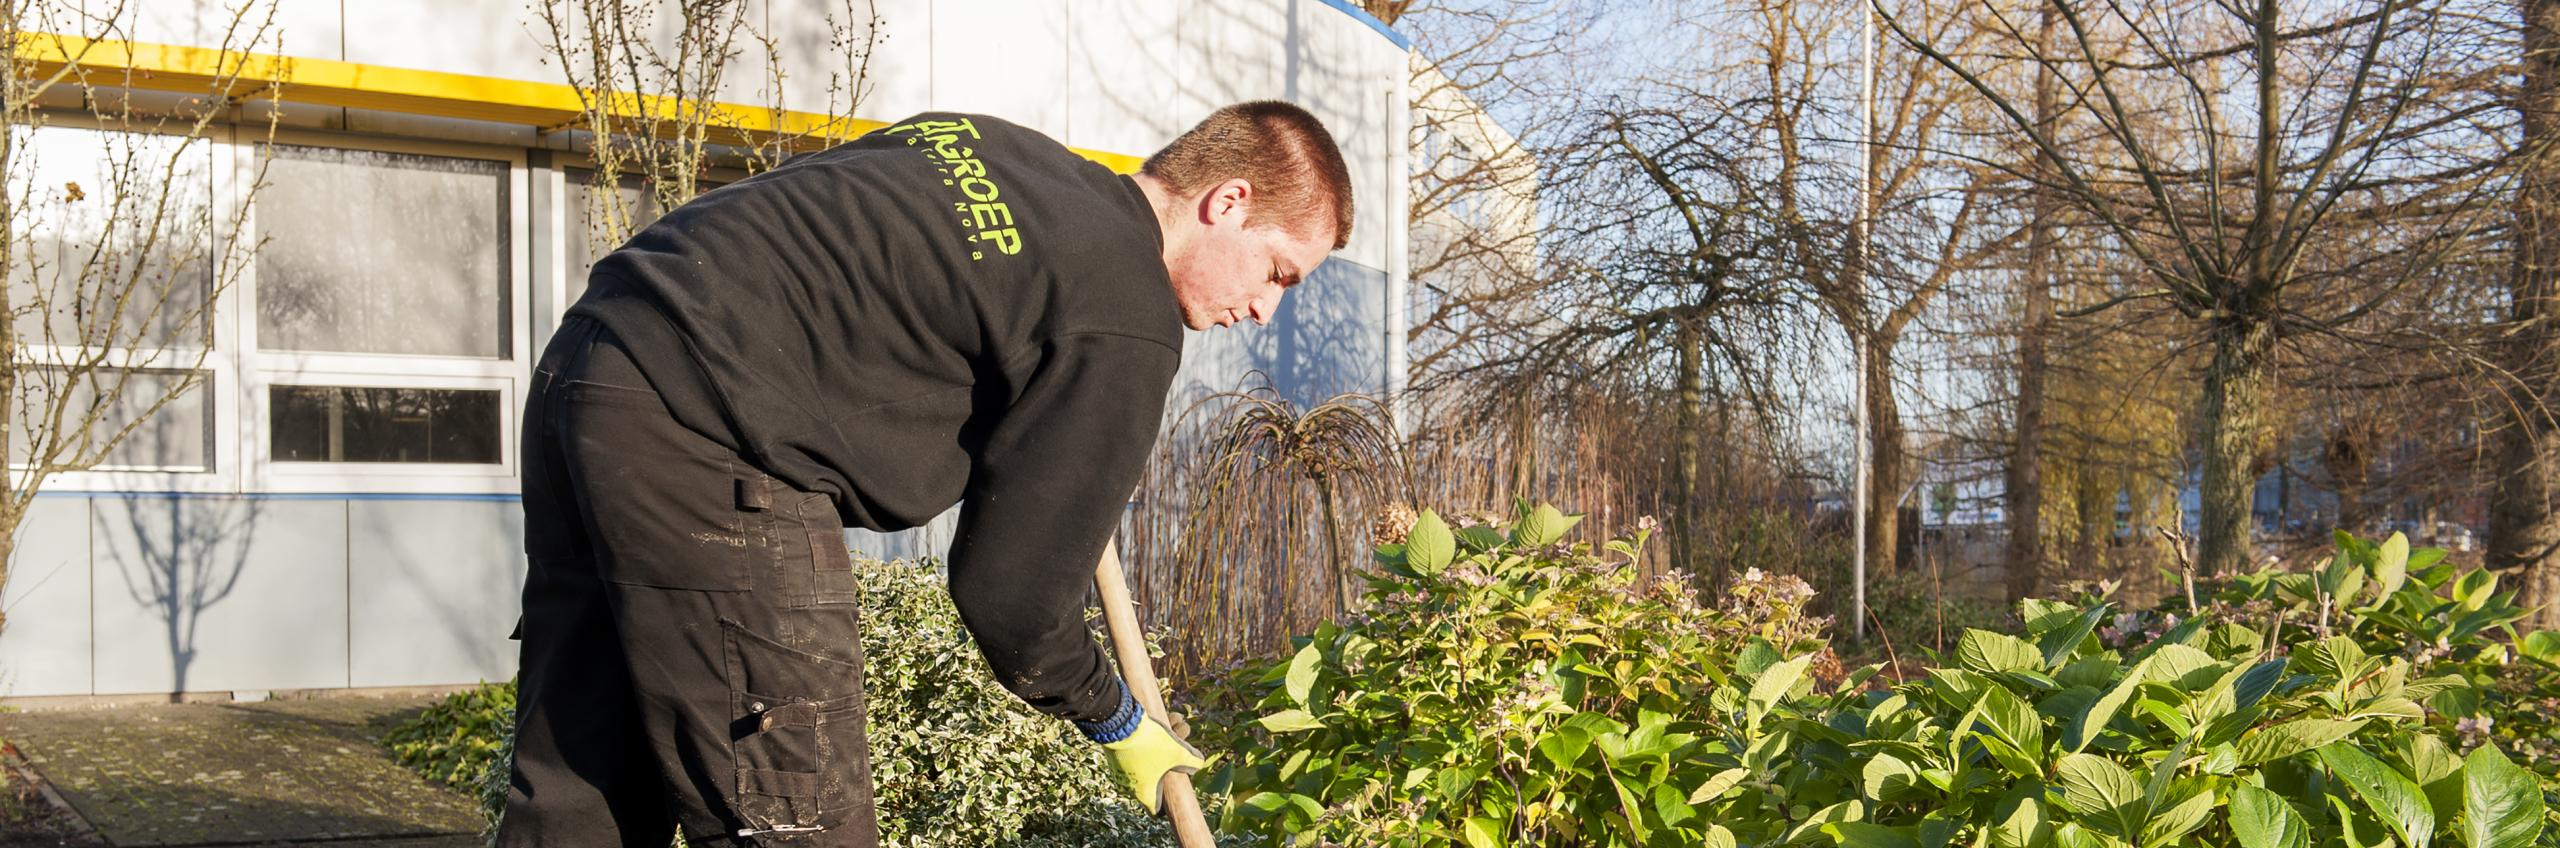 Medewerker hovenier scalda for Opleiding tuin